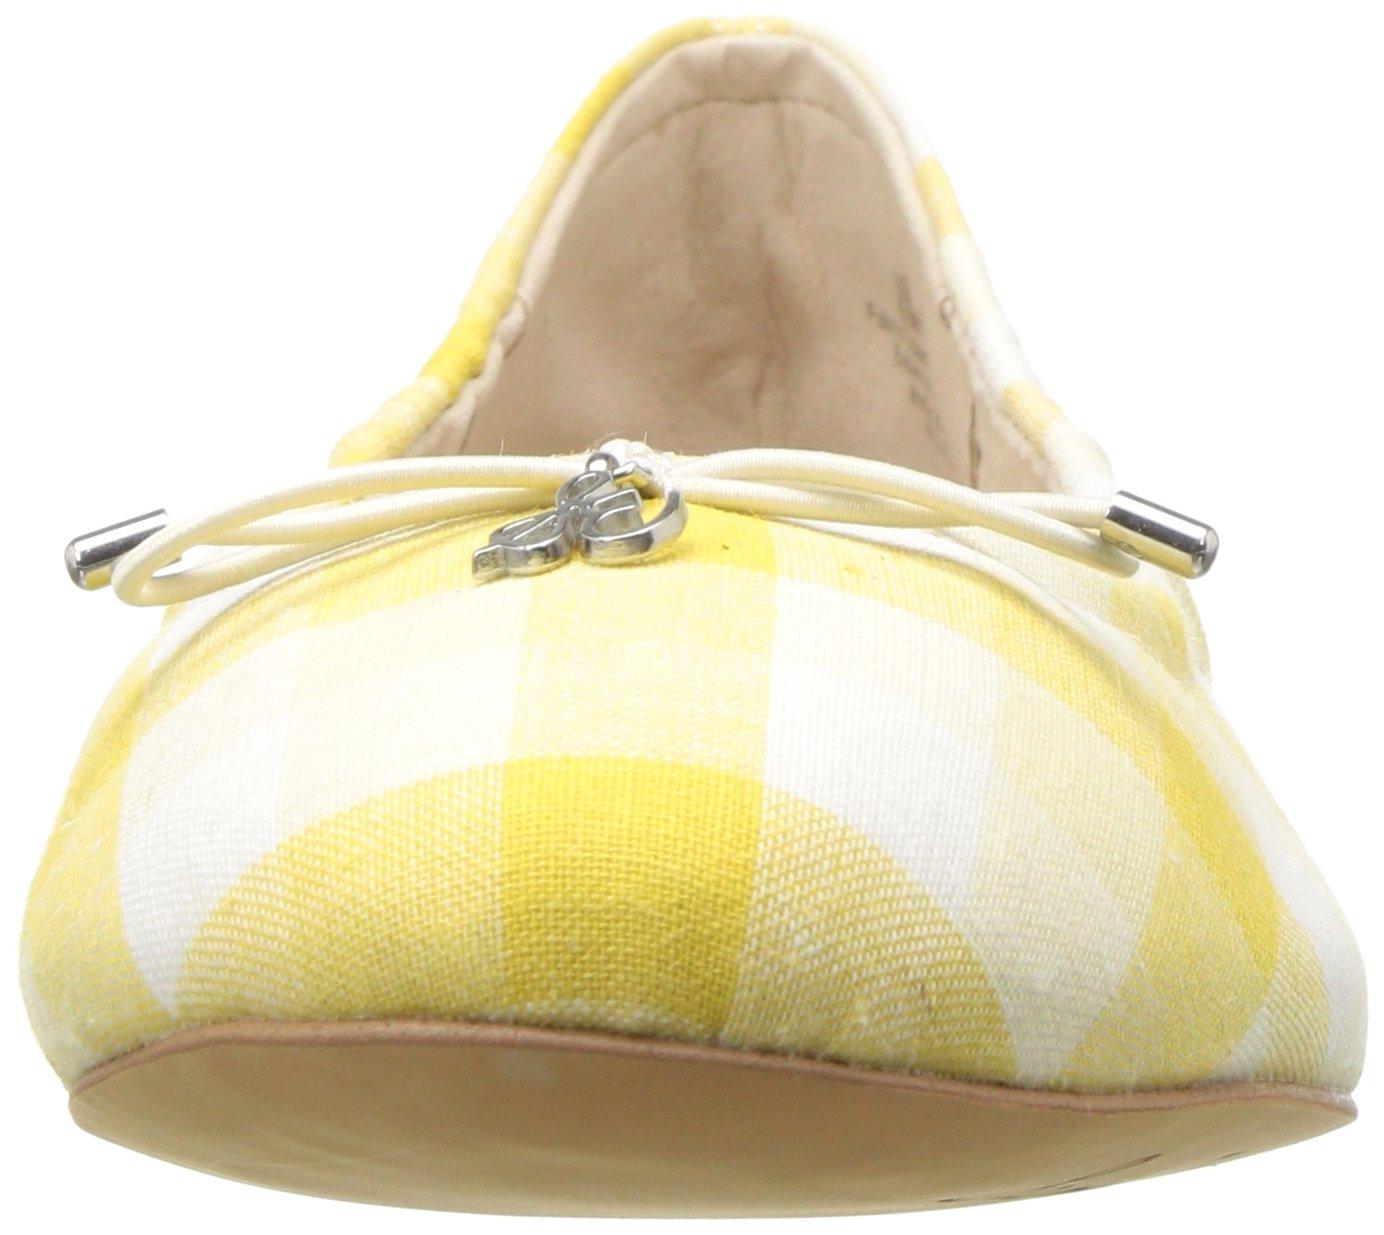 Sam Edelman Women's Felicia Ballet Flat B078HFL9NM 6 B(M) US Yellow/Multi Gingham